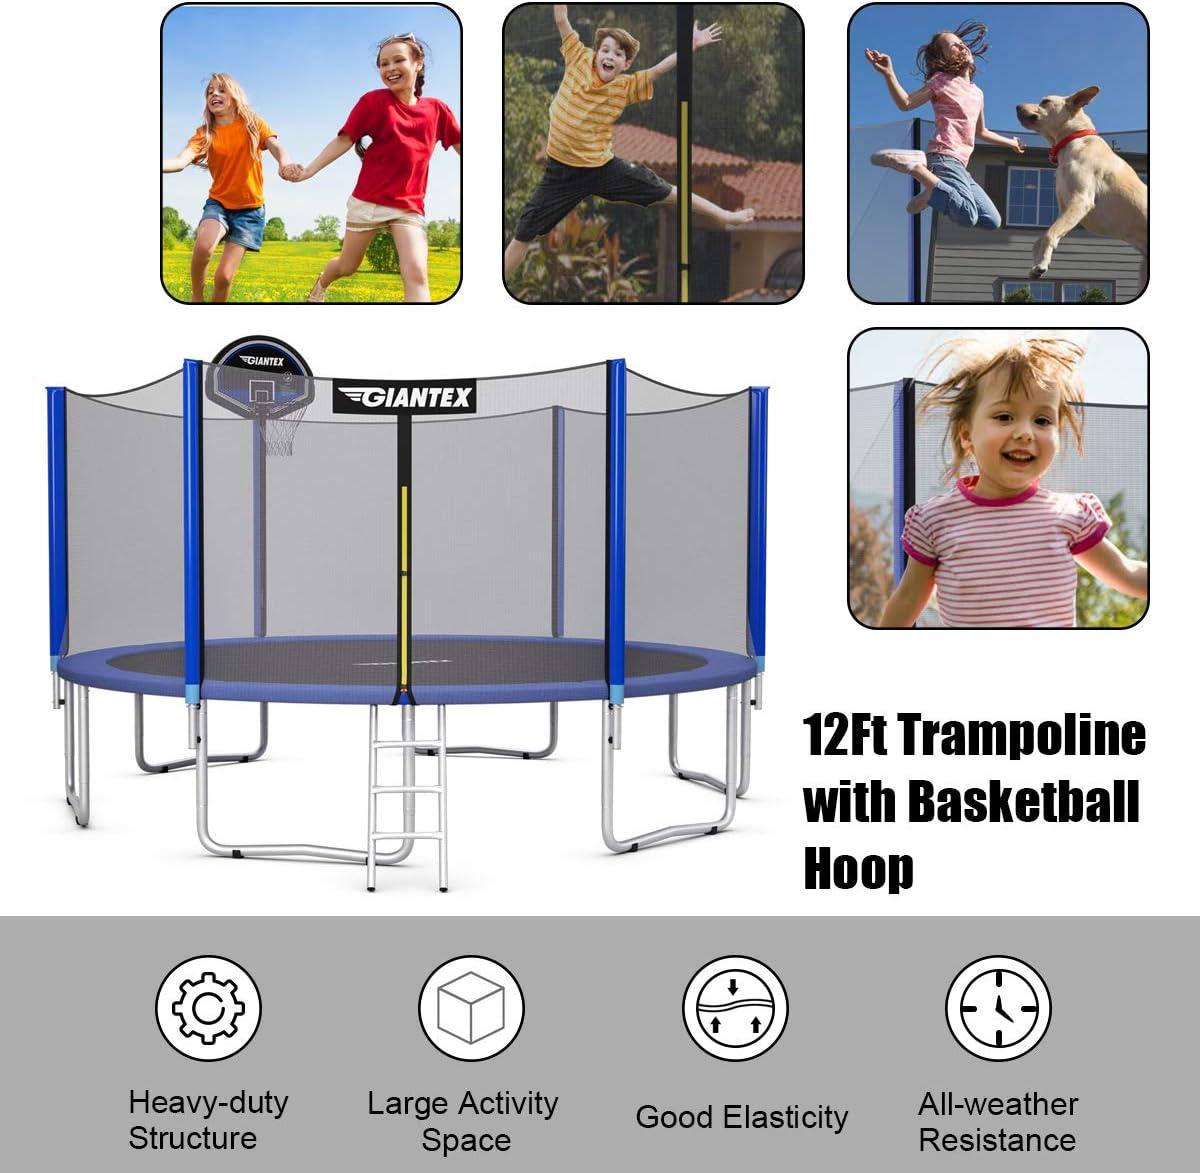 Ladder Adults 10Ft 12Ft 14Ft 15Ft 16Ft Enclosed Trampoline w//Basketball Hoop Giantex Trampoline Safety Enclosure Net Spring Pad Outdoor Big Trampoline Basketball Hoop for Kids